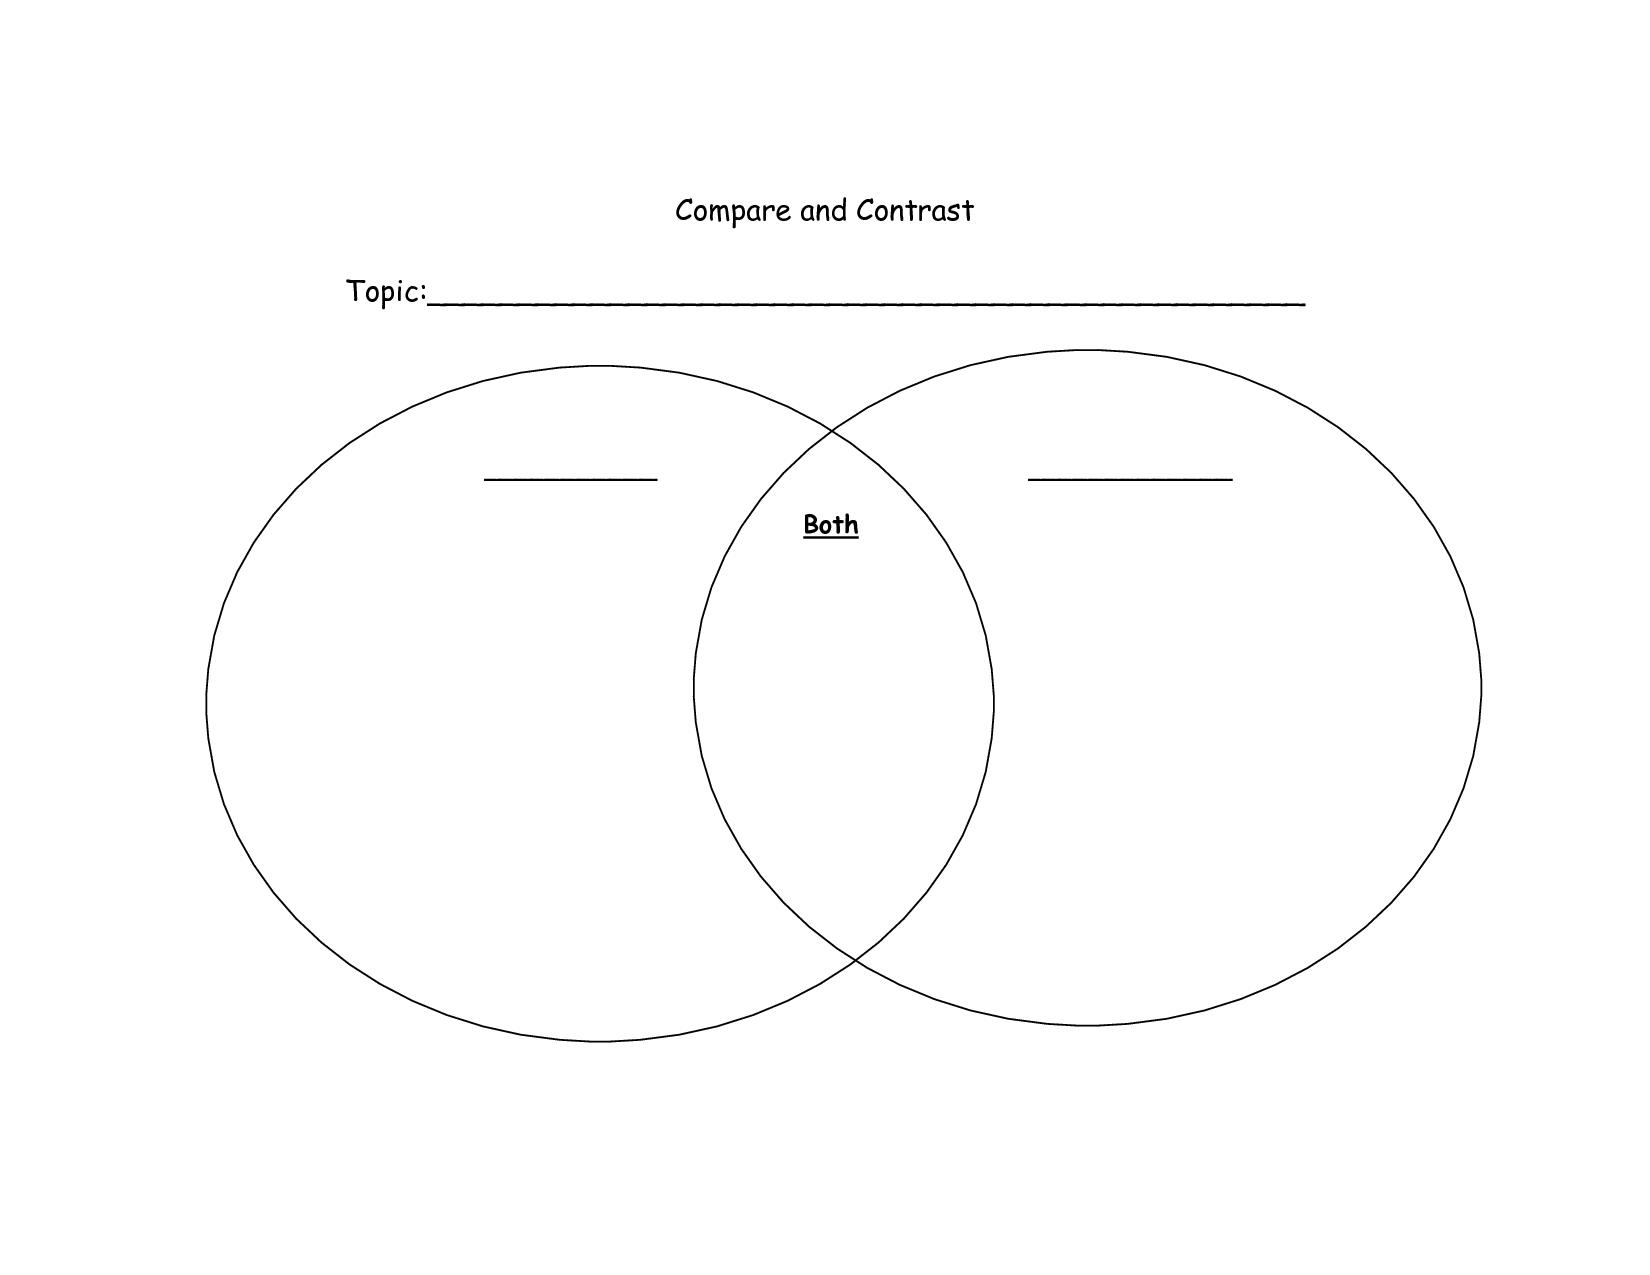 Venn Diagram Templates | Venn Diagram Template - Doc | School Stuff - Free Printable Venn Diagram